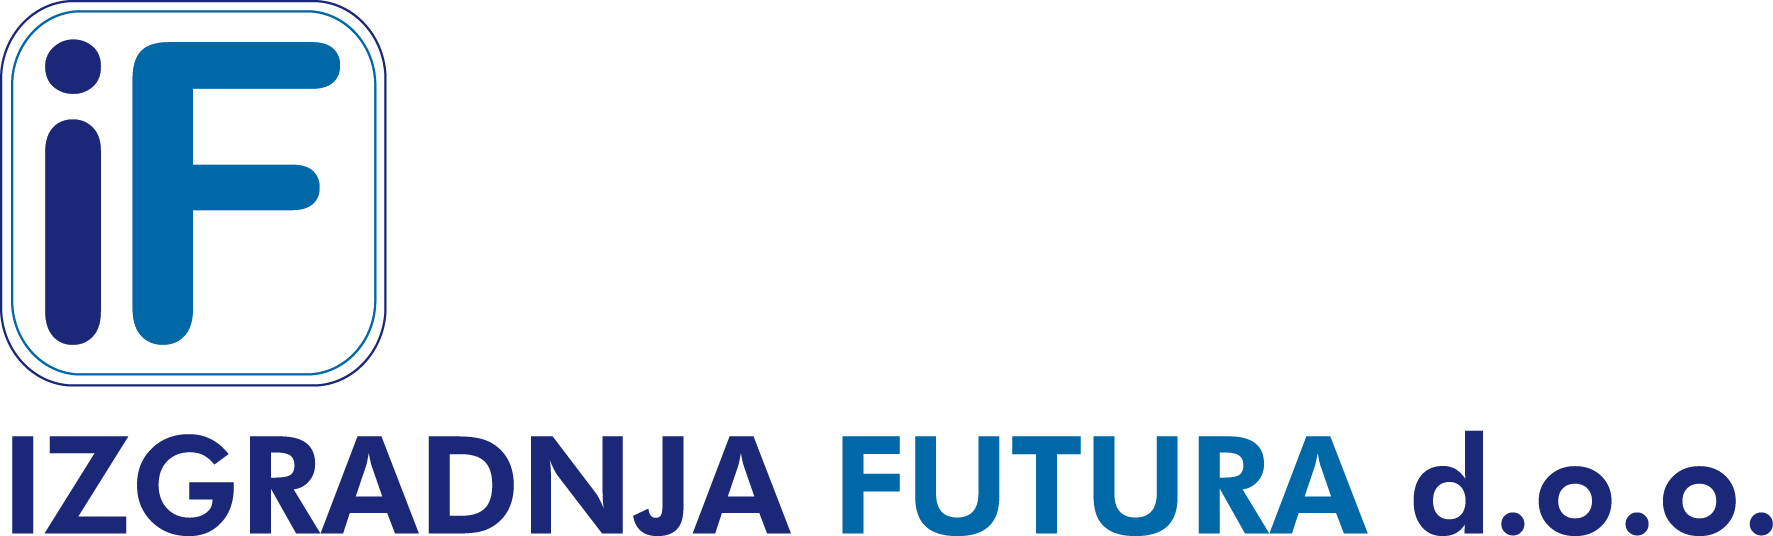 izgradnja futura logo